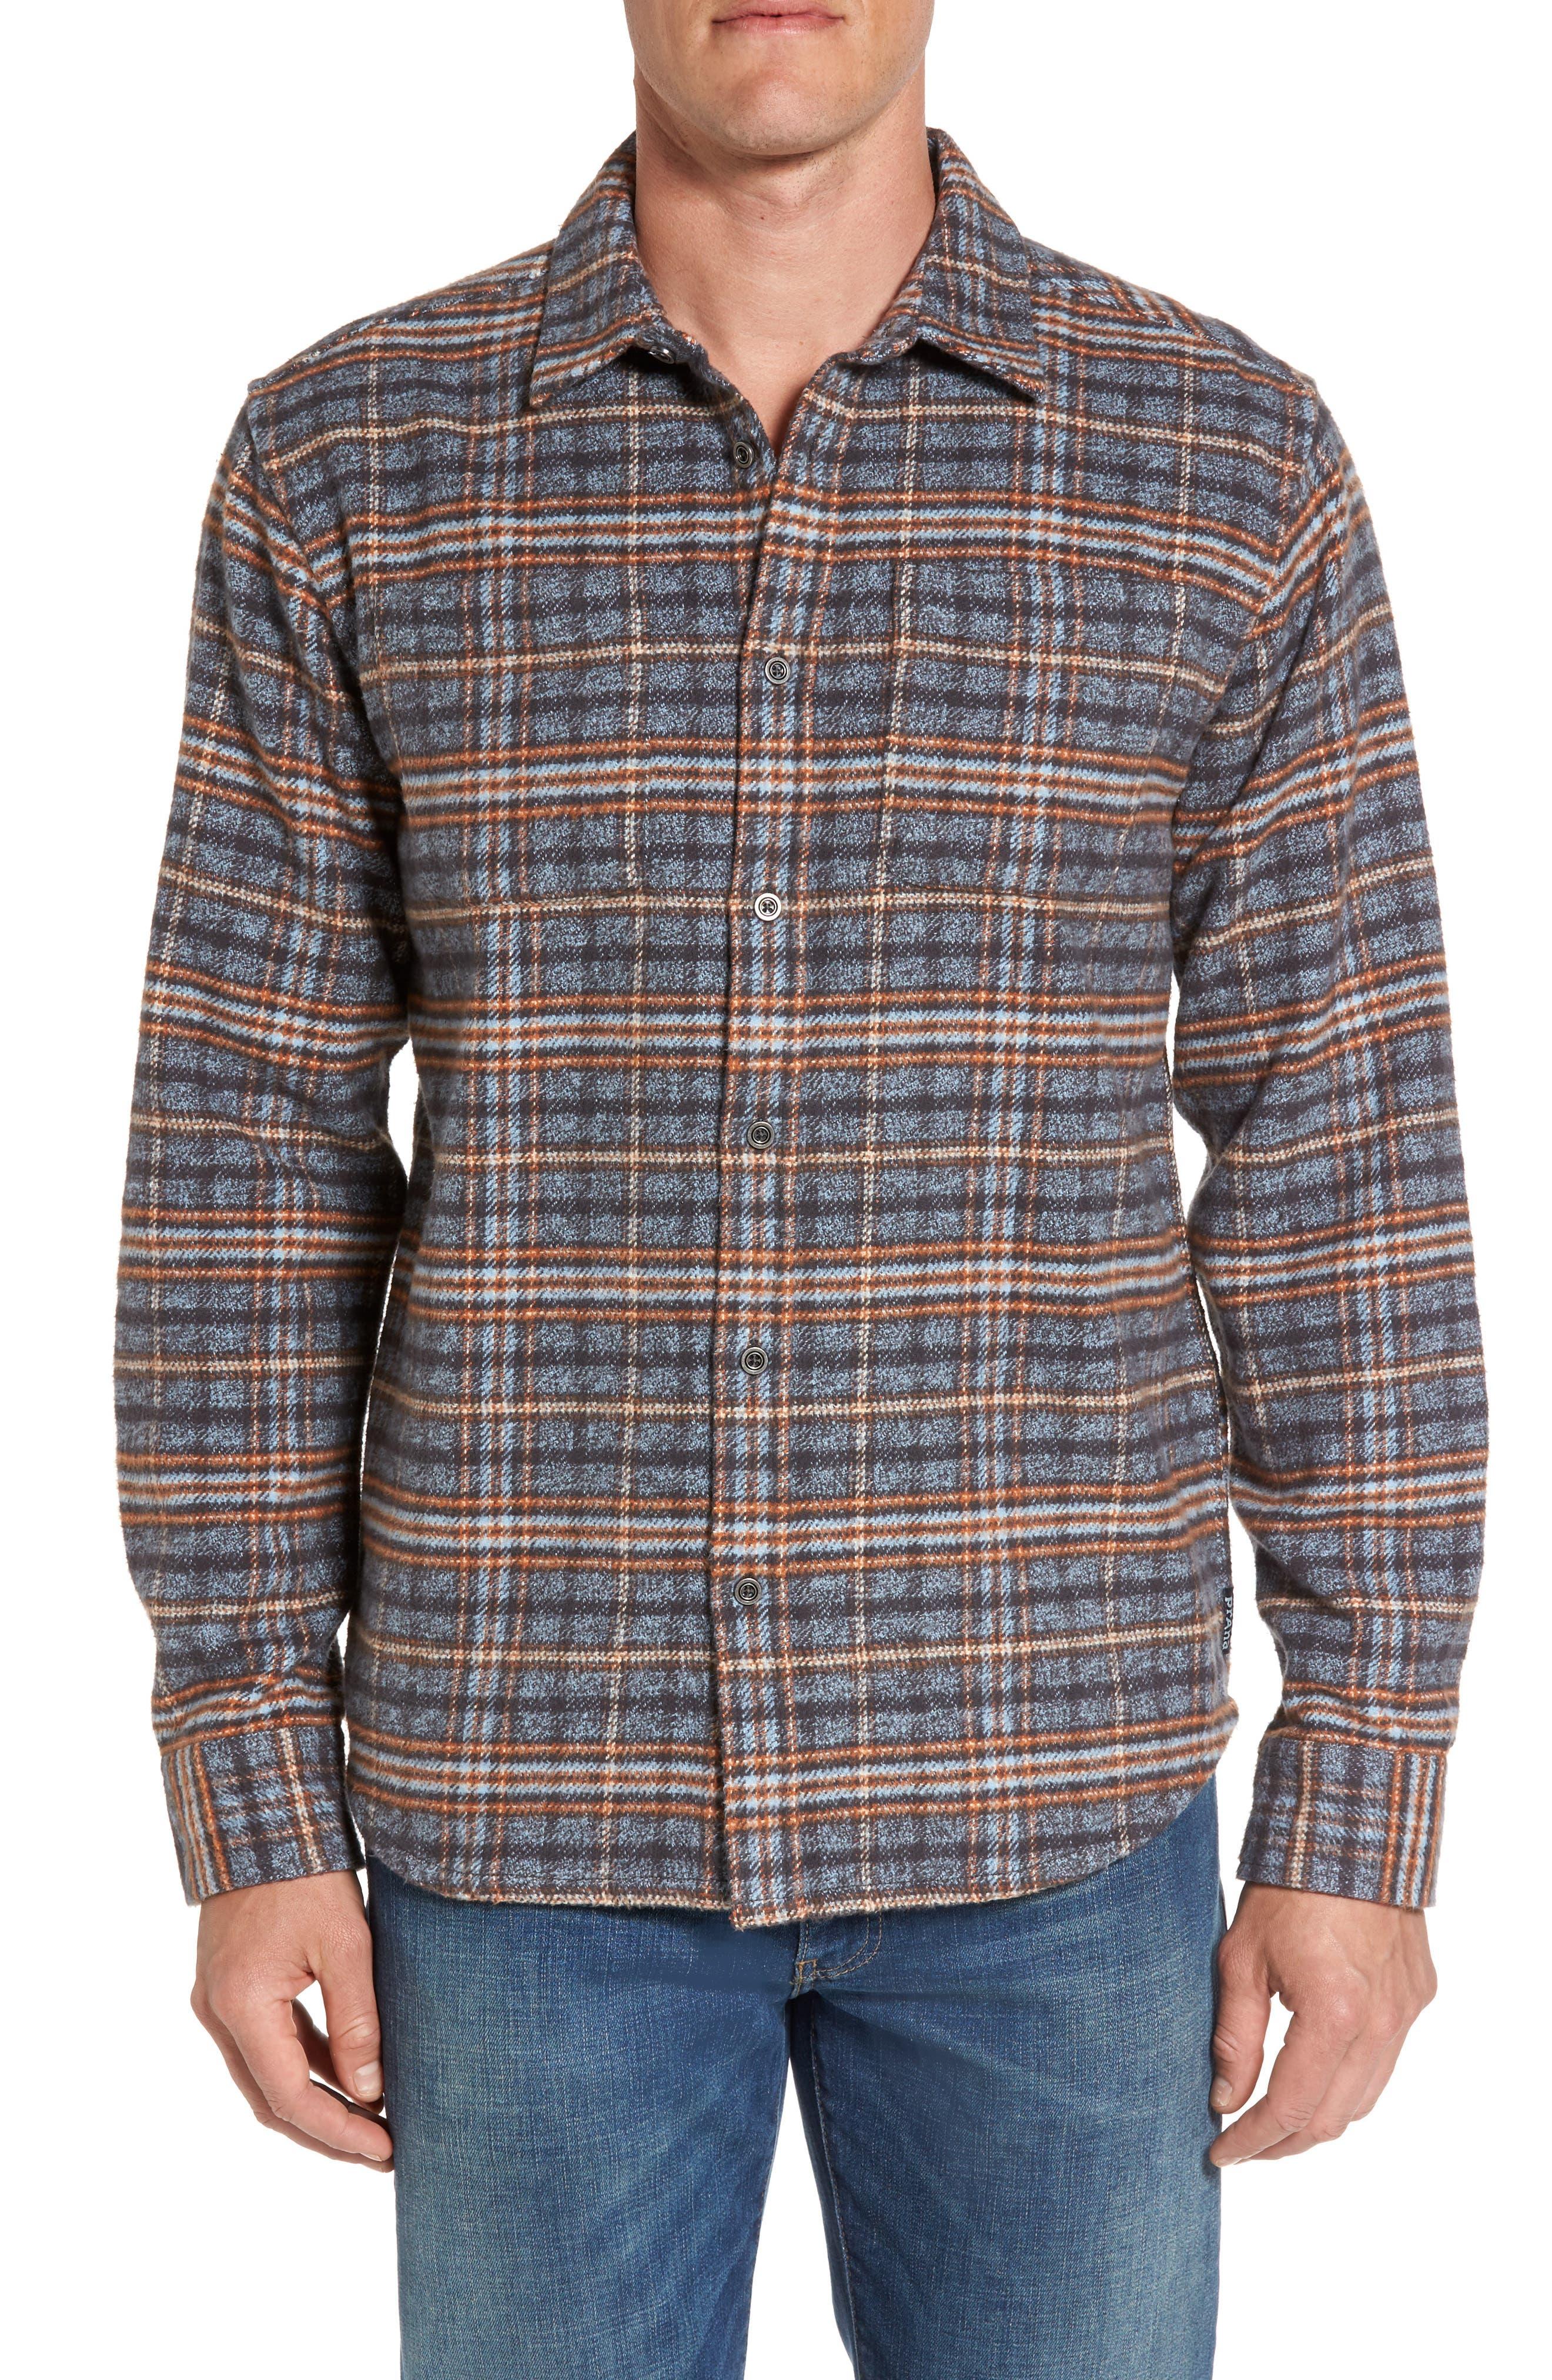 Main Image - prAna Brayden Regular Fit Plaid Flannel Shirt